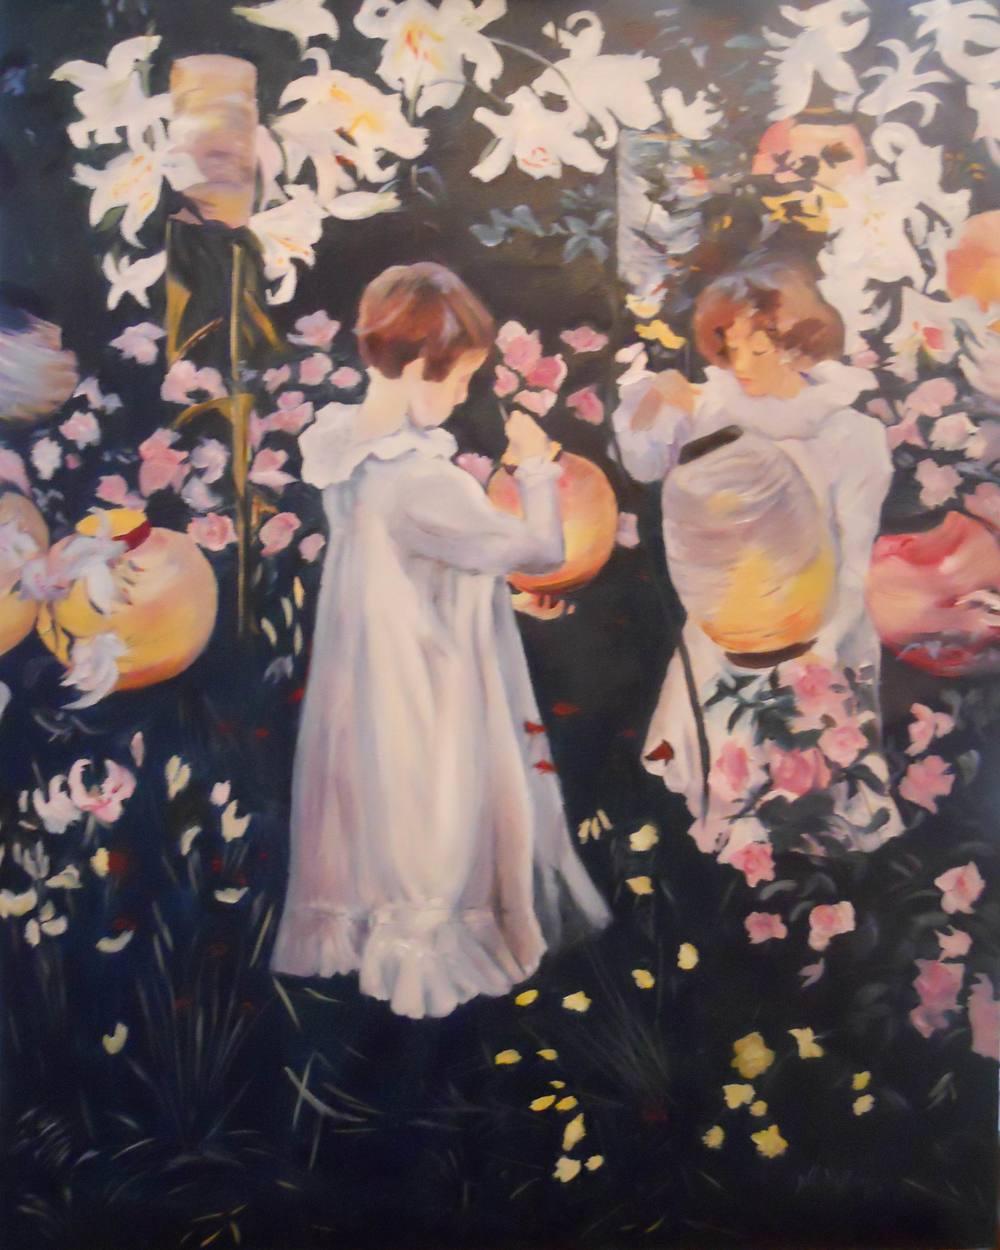 Carnation, Lily, Lily Rose - 30x24